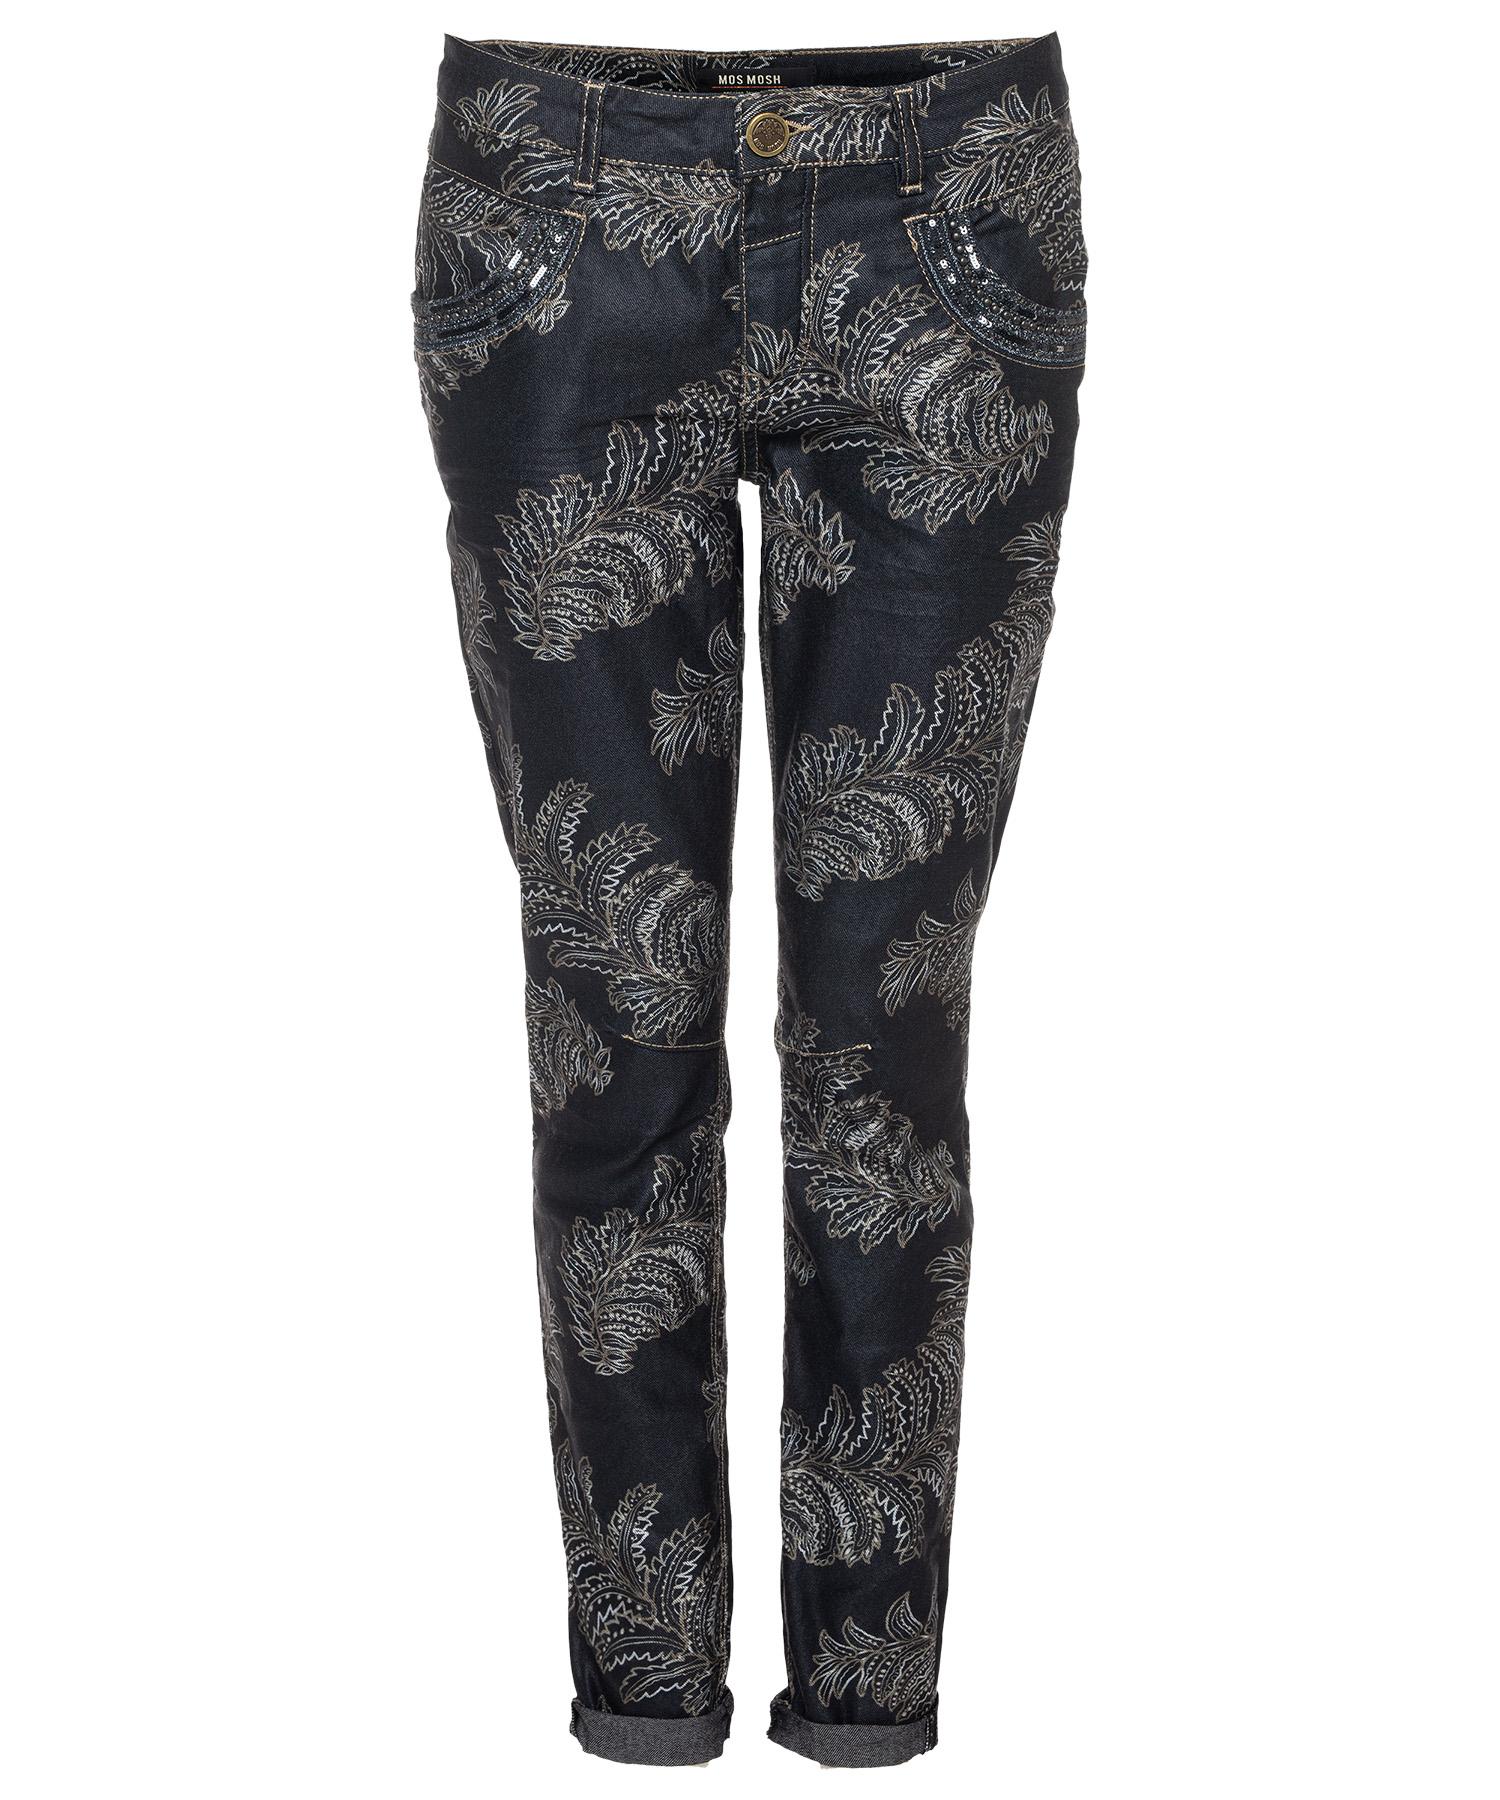 Naomi Mos Mosh Printed Jeans Mos uFclKJ1T3